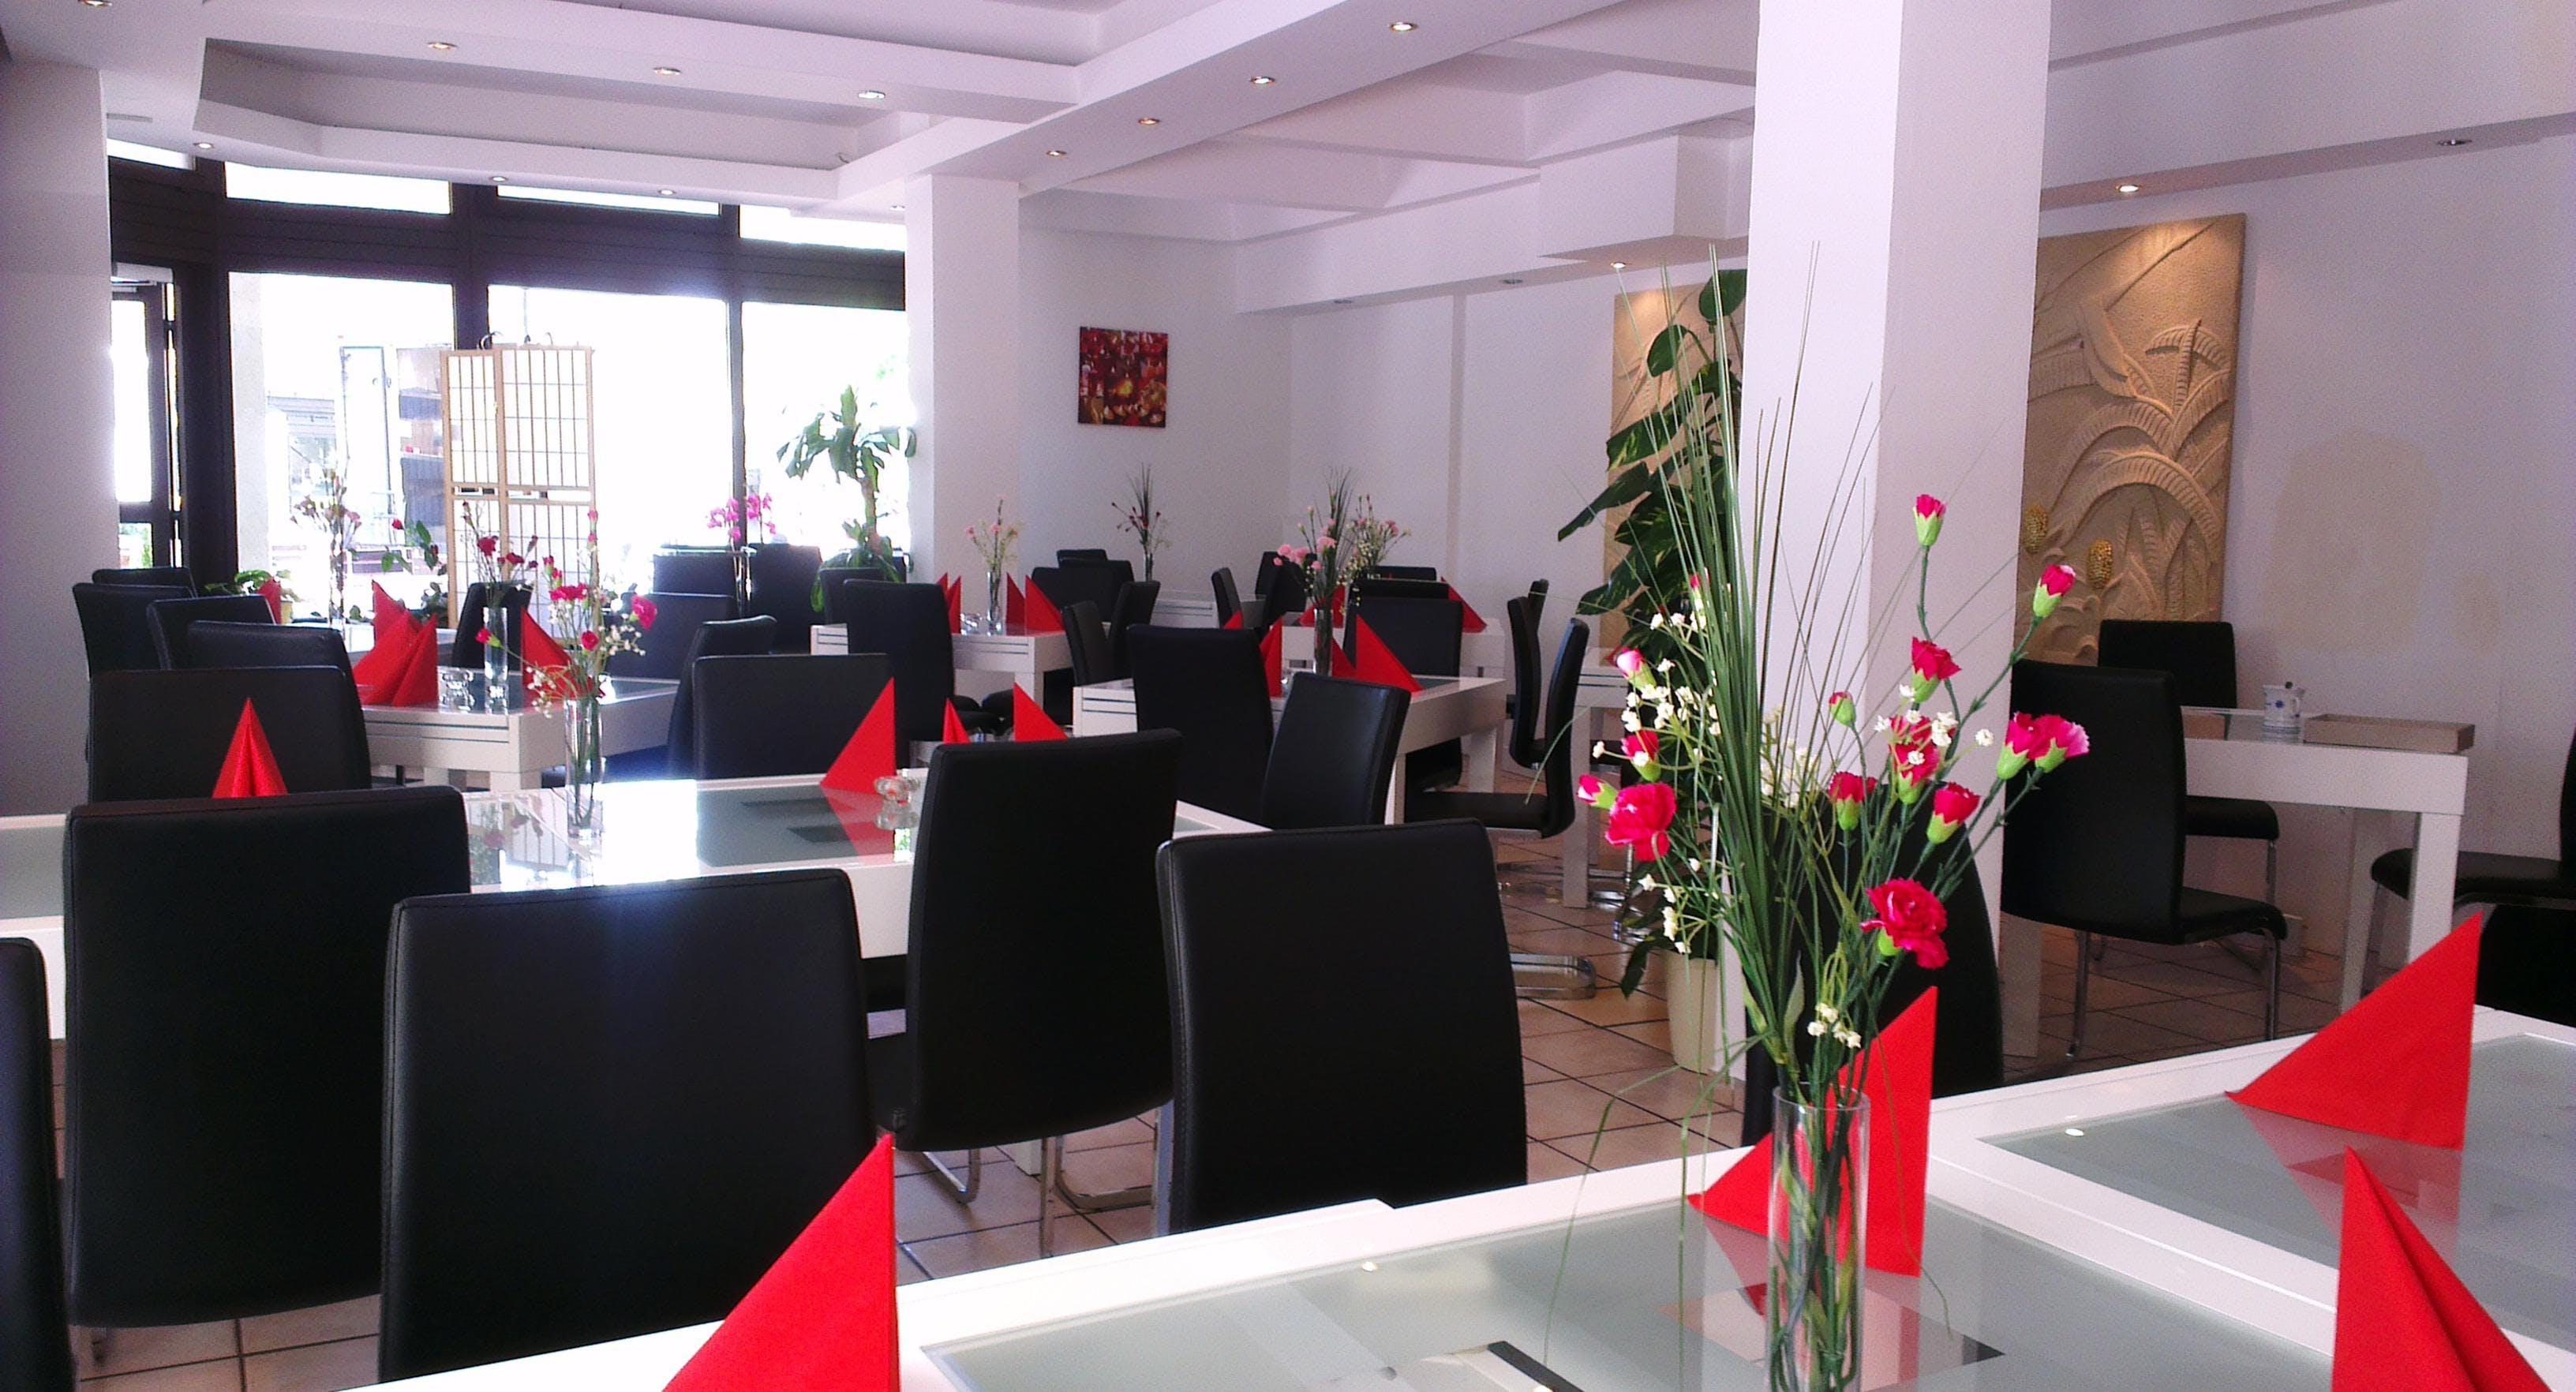 Honghong Restaurant Garching München image 3